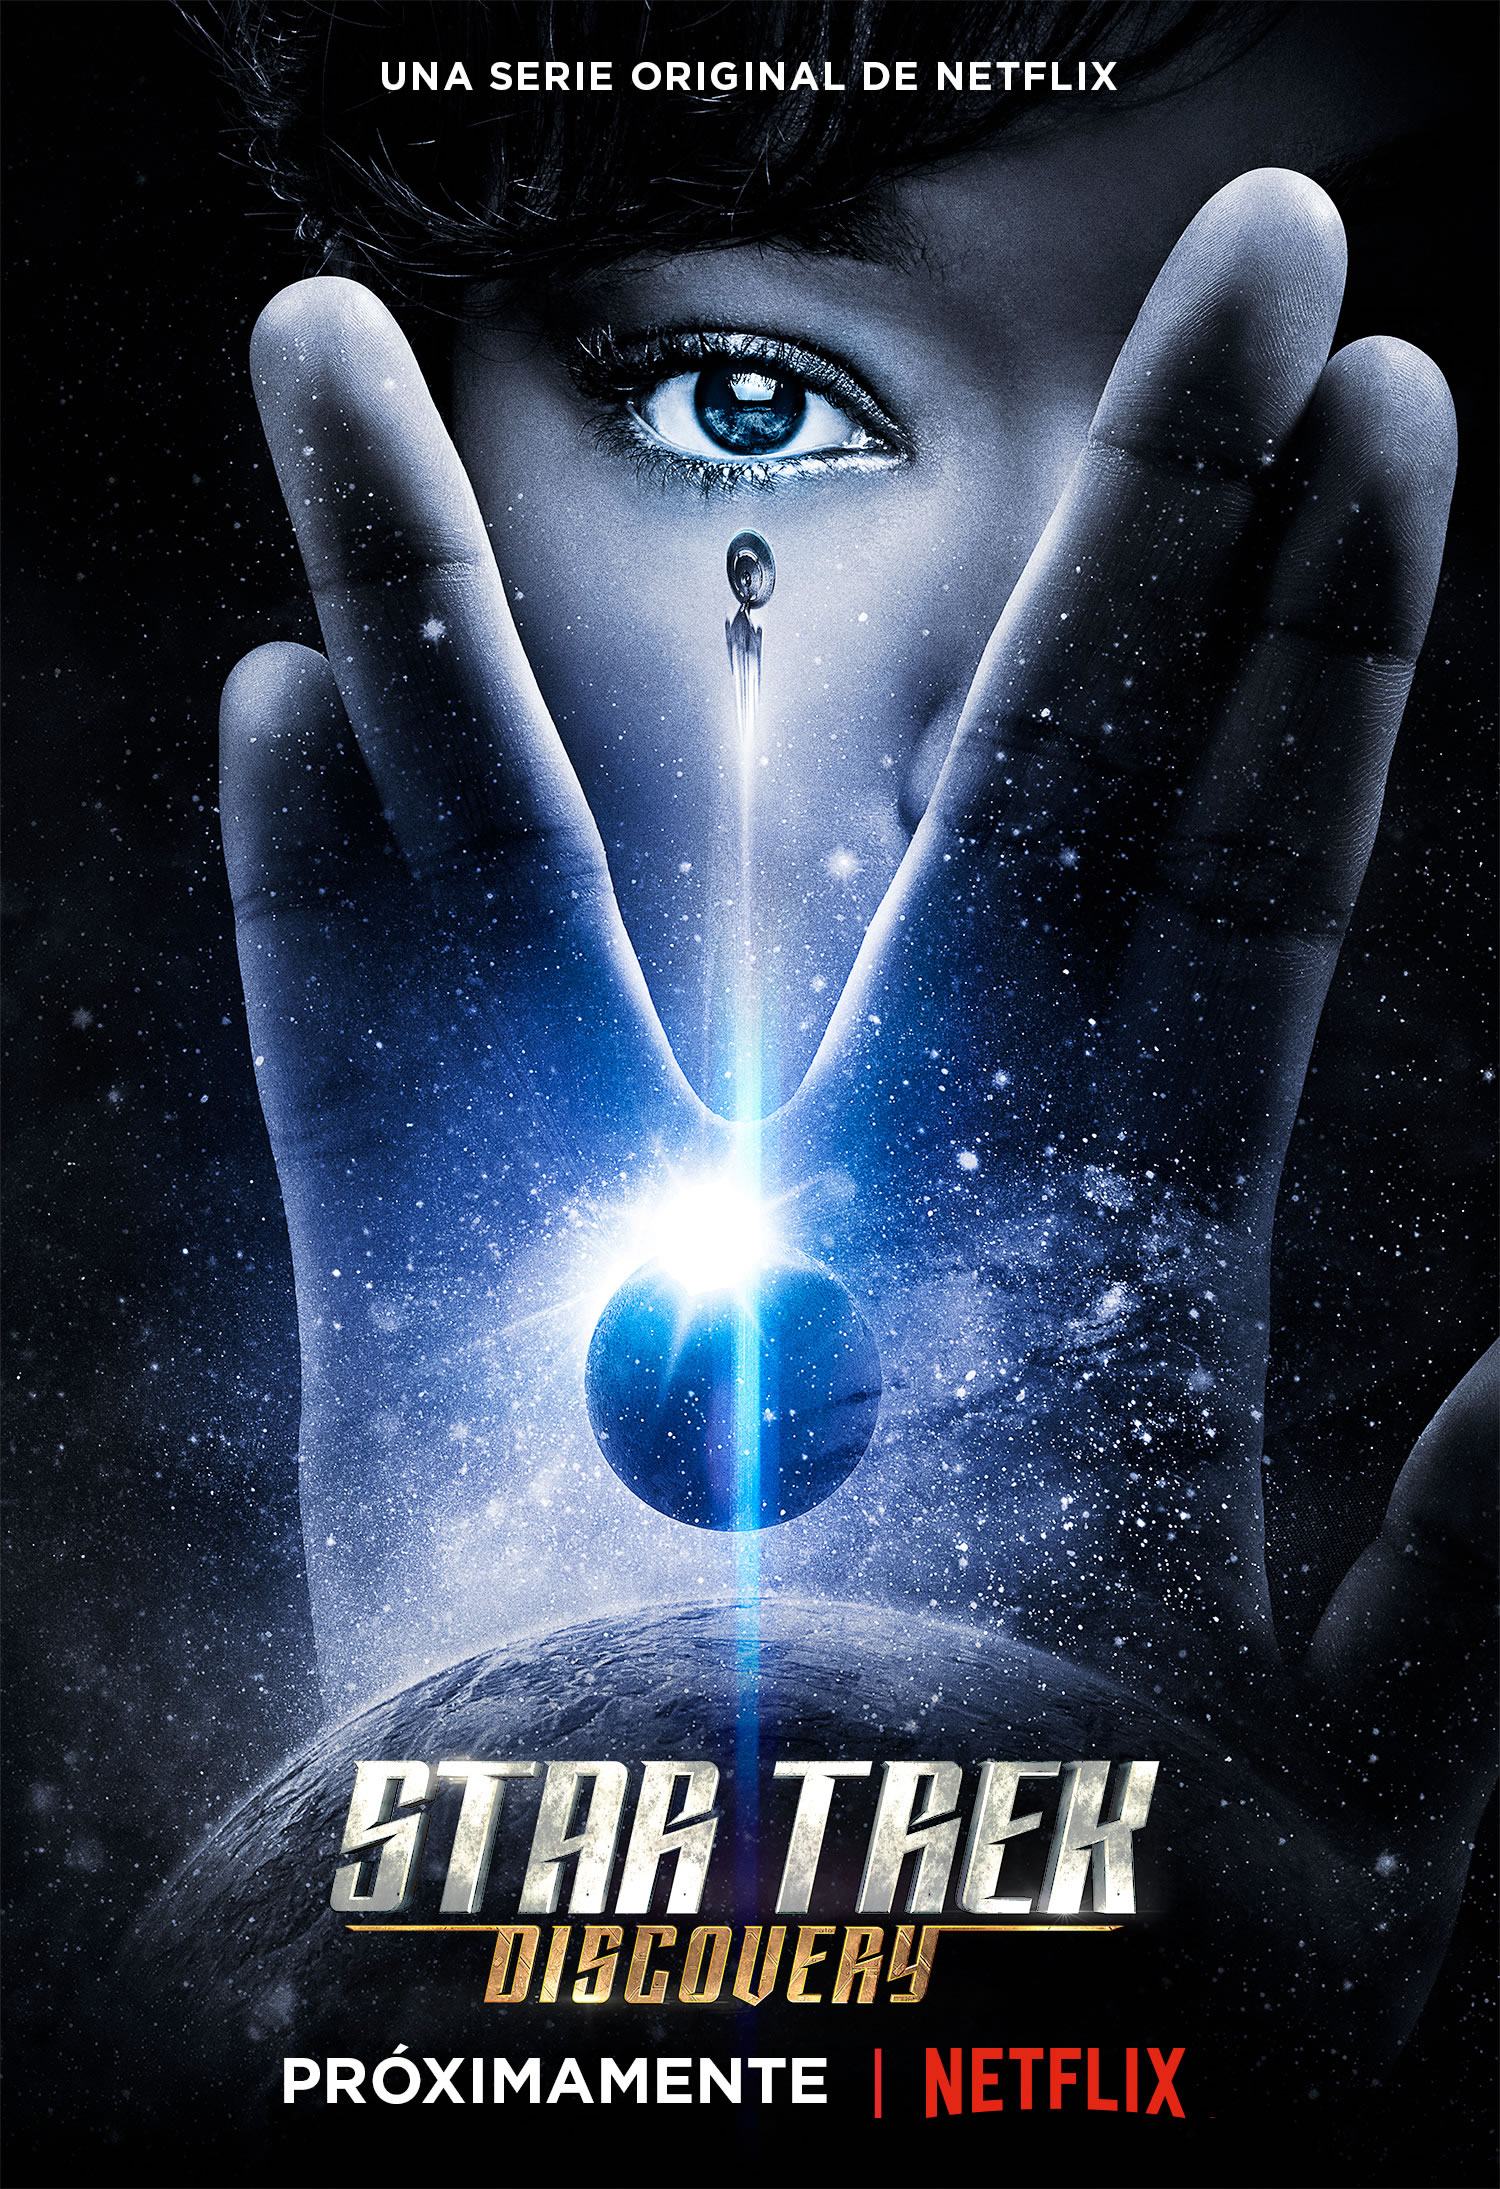 Star Trek: Discovery - Póster oficial.